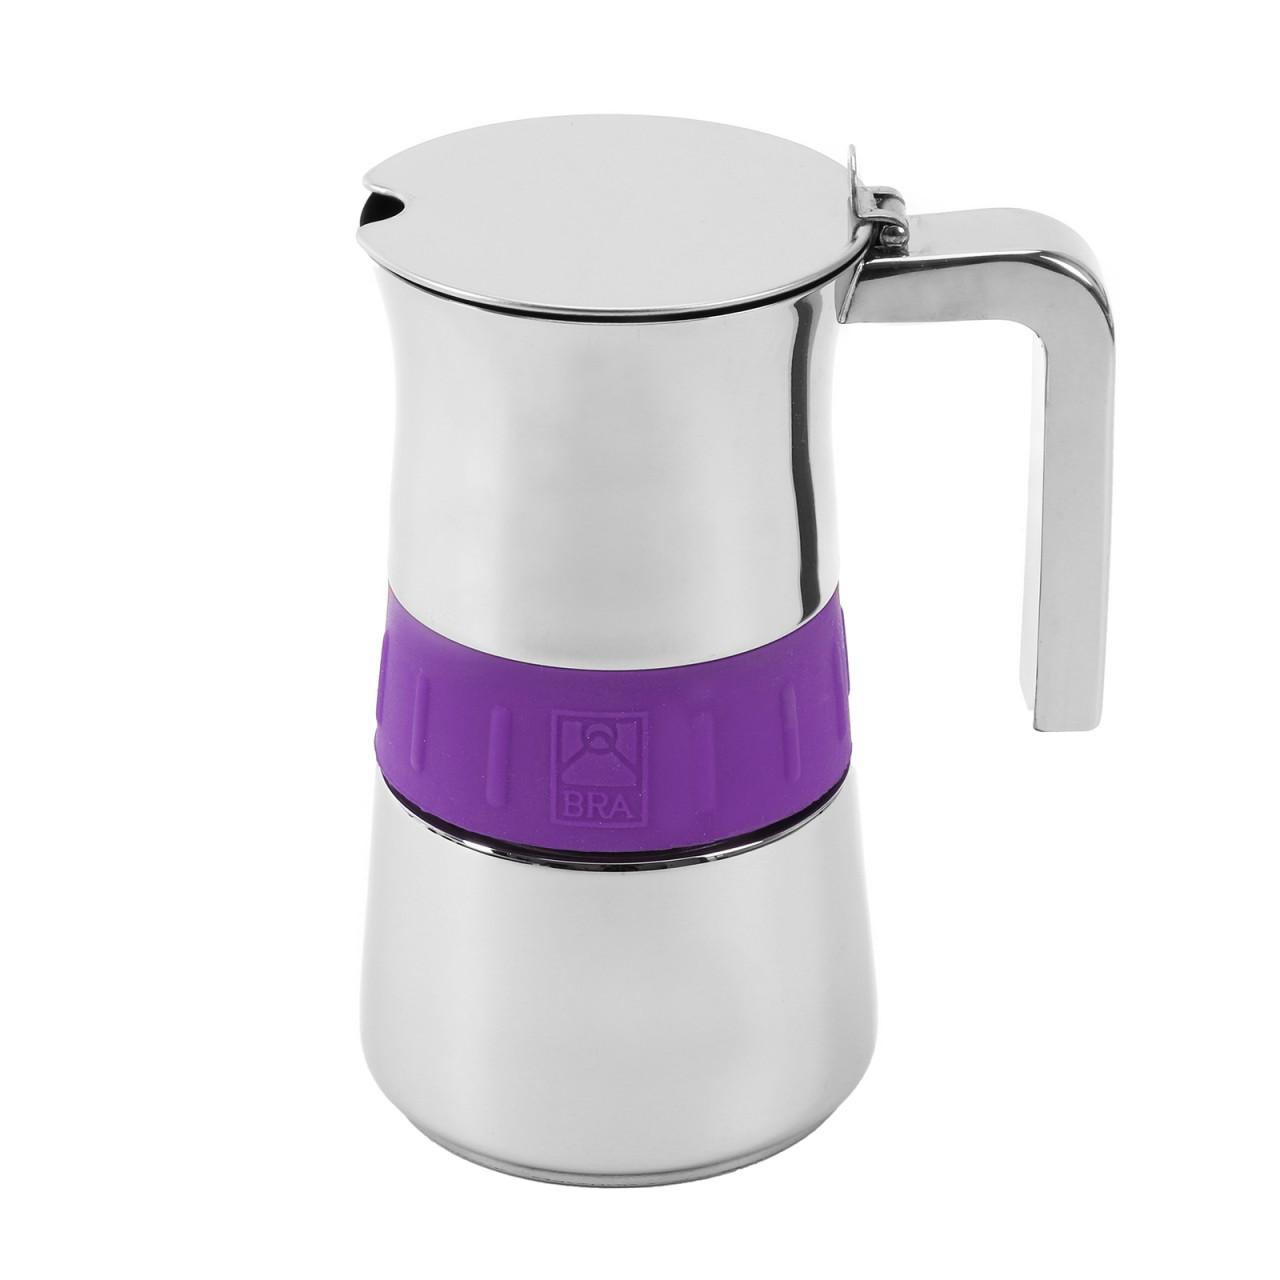 pintinox edelstahl espressokocher elegance lila f r bis zu 6 tassen. Black Bedroom Furniture Sets. Home Design Ideas